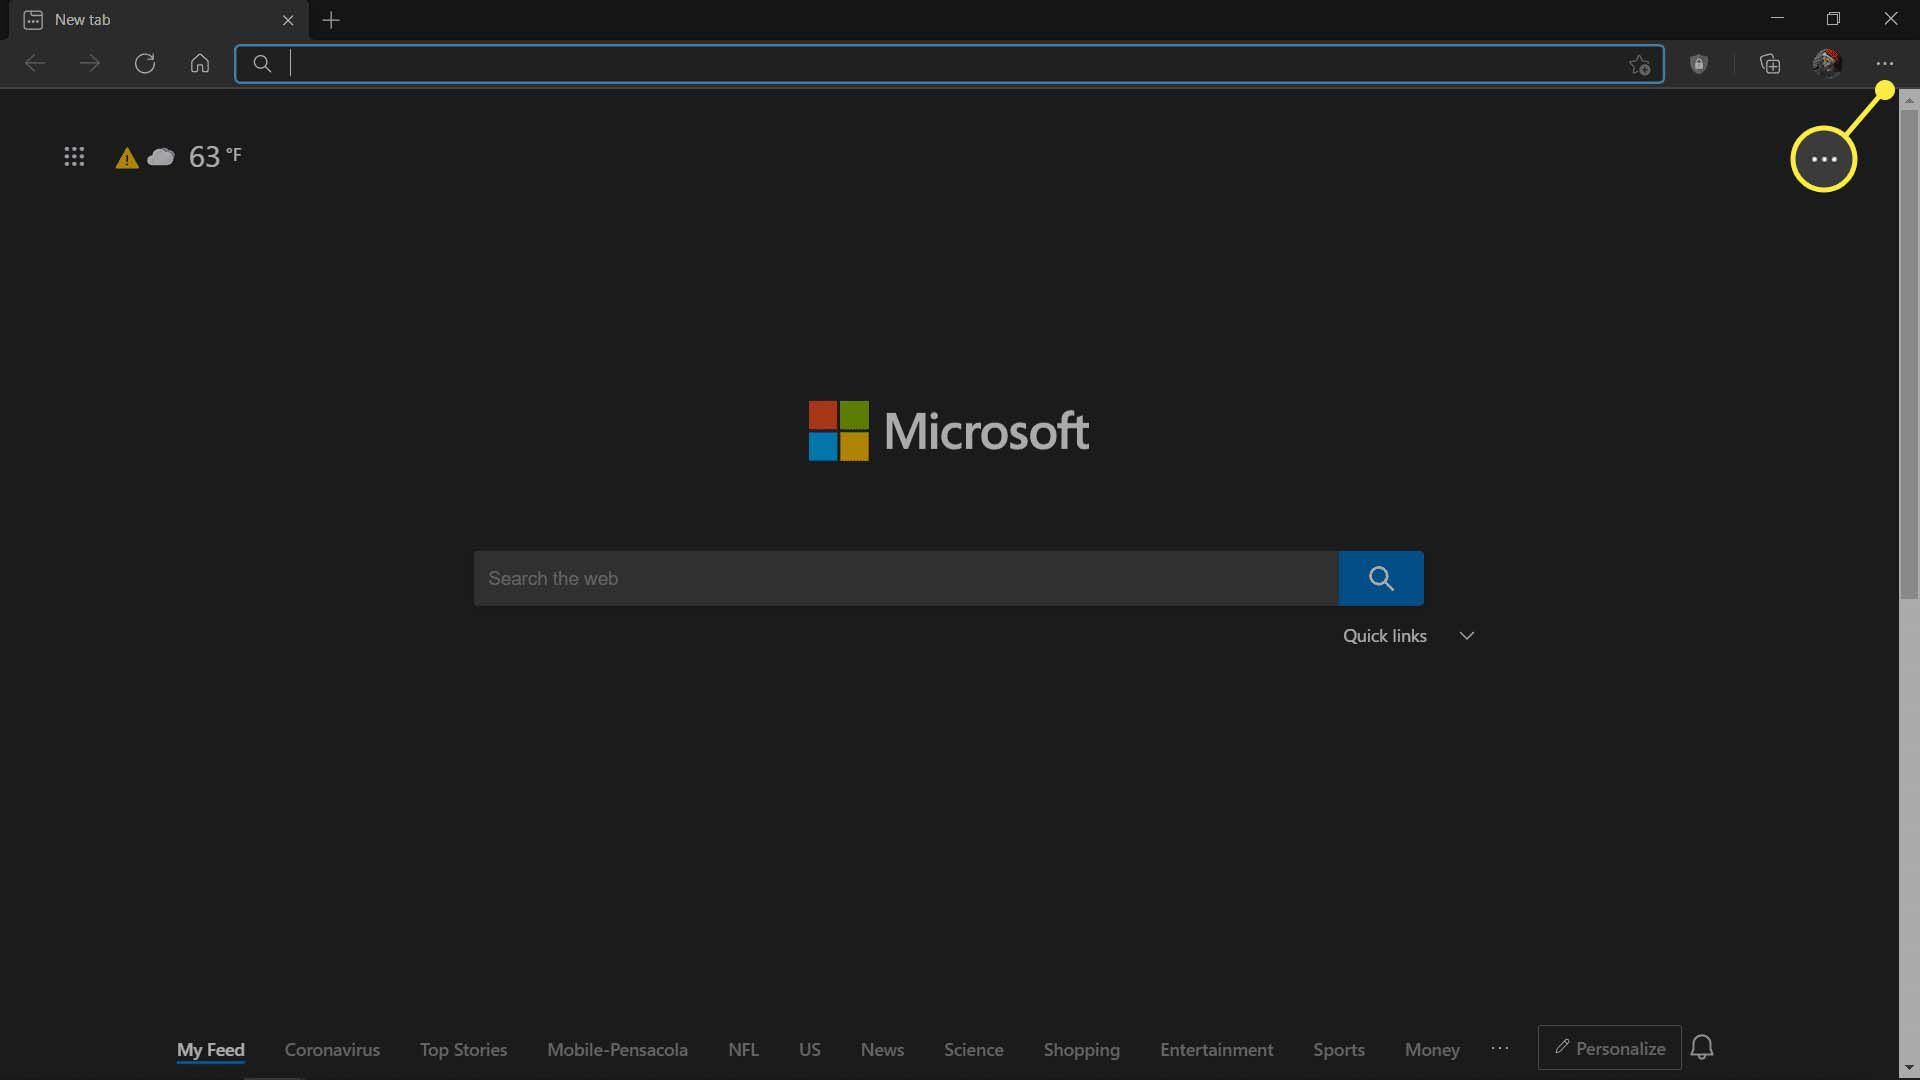 MS Edge's main menu button highlighted.